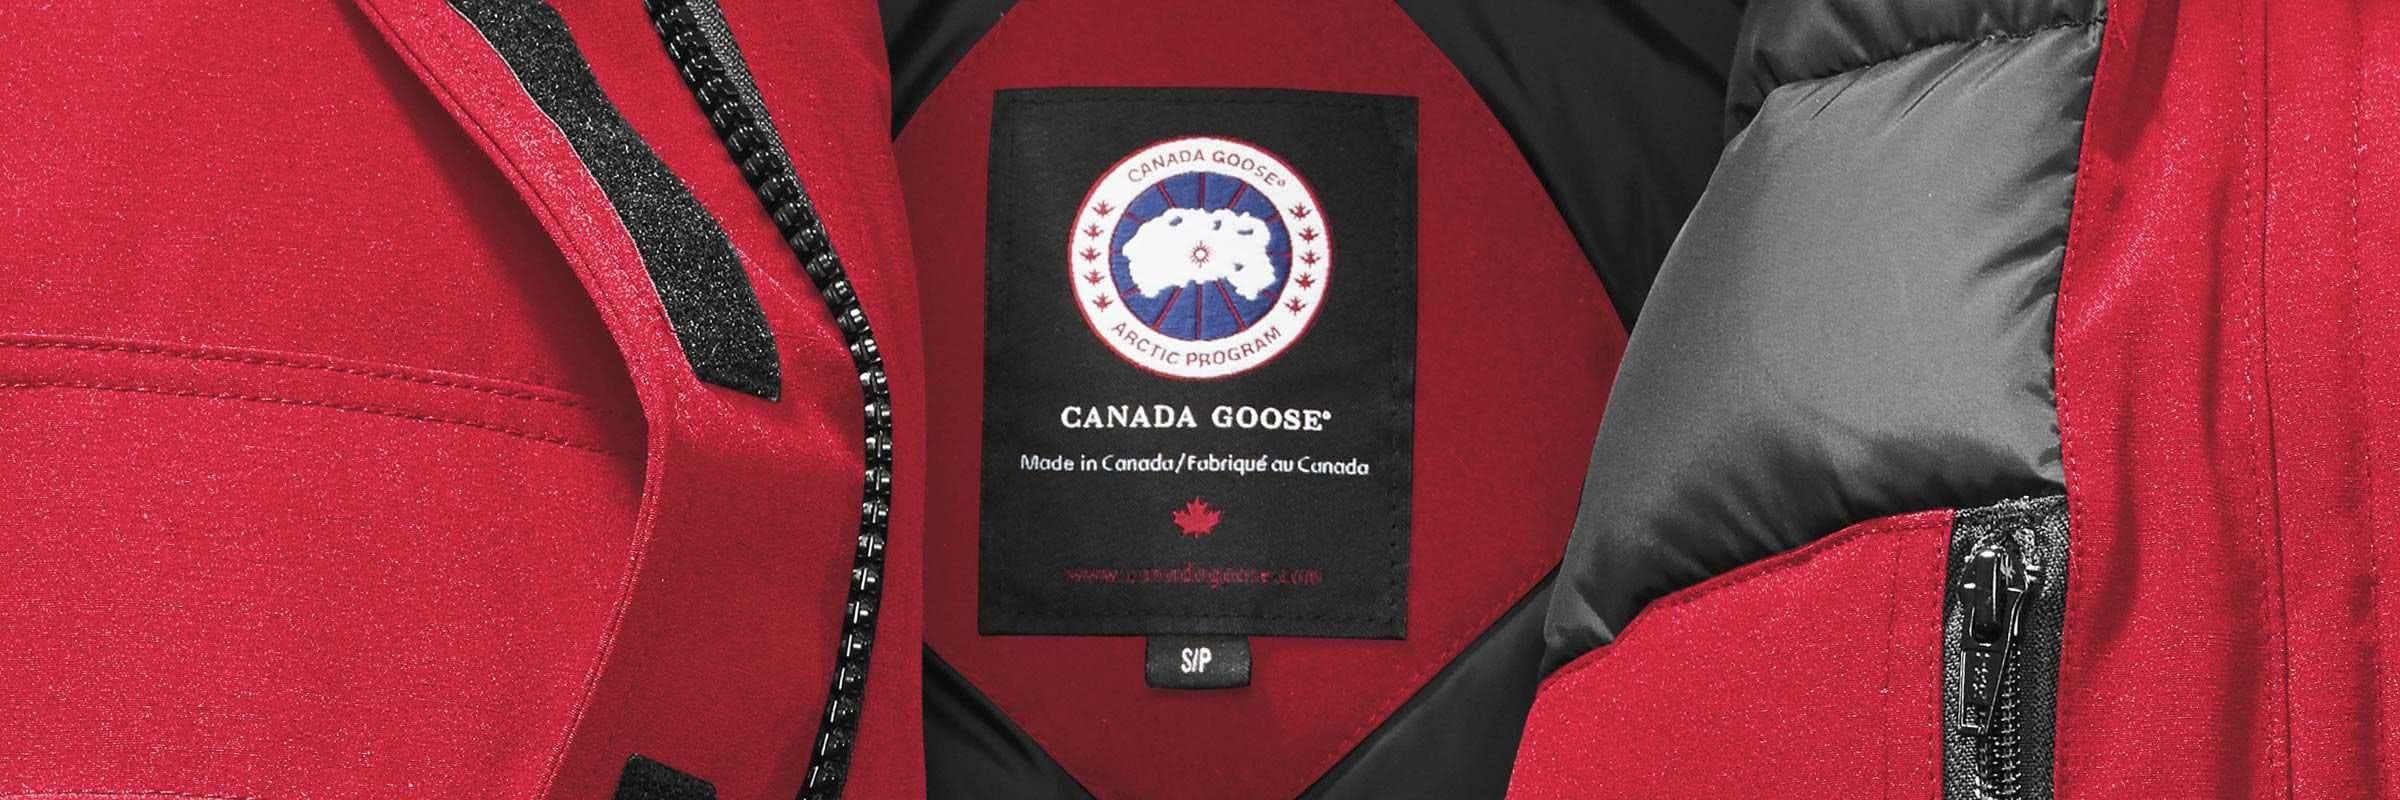 manteau marque canada goose